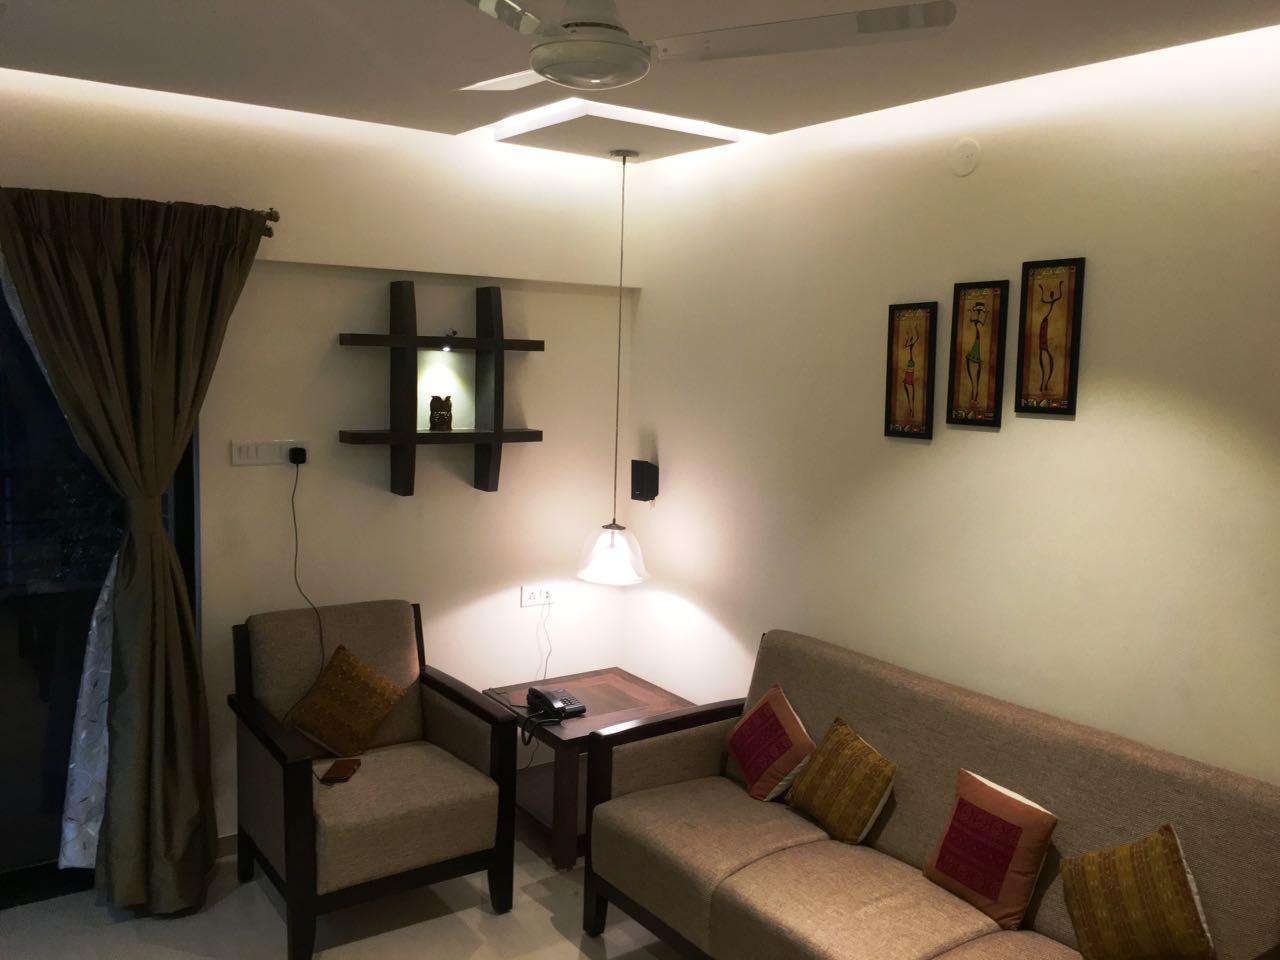 Life of a Living Room by Rohan Puranik